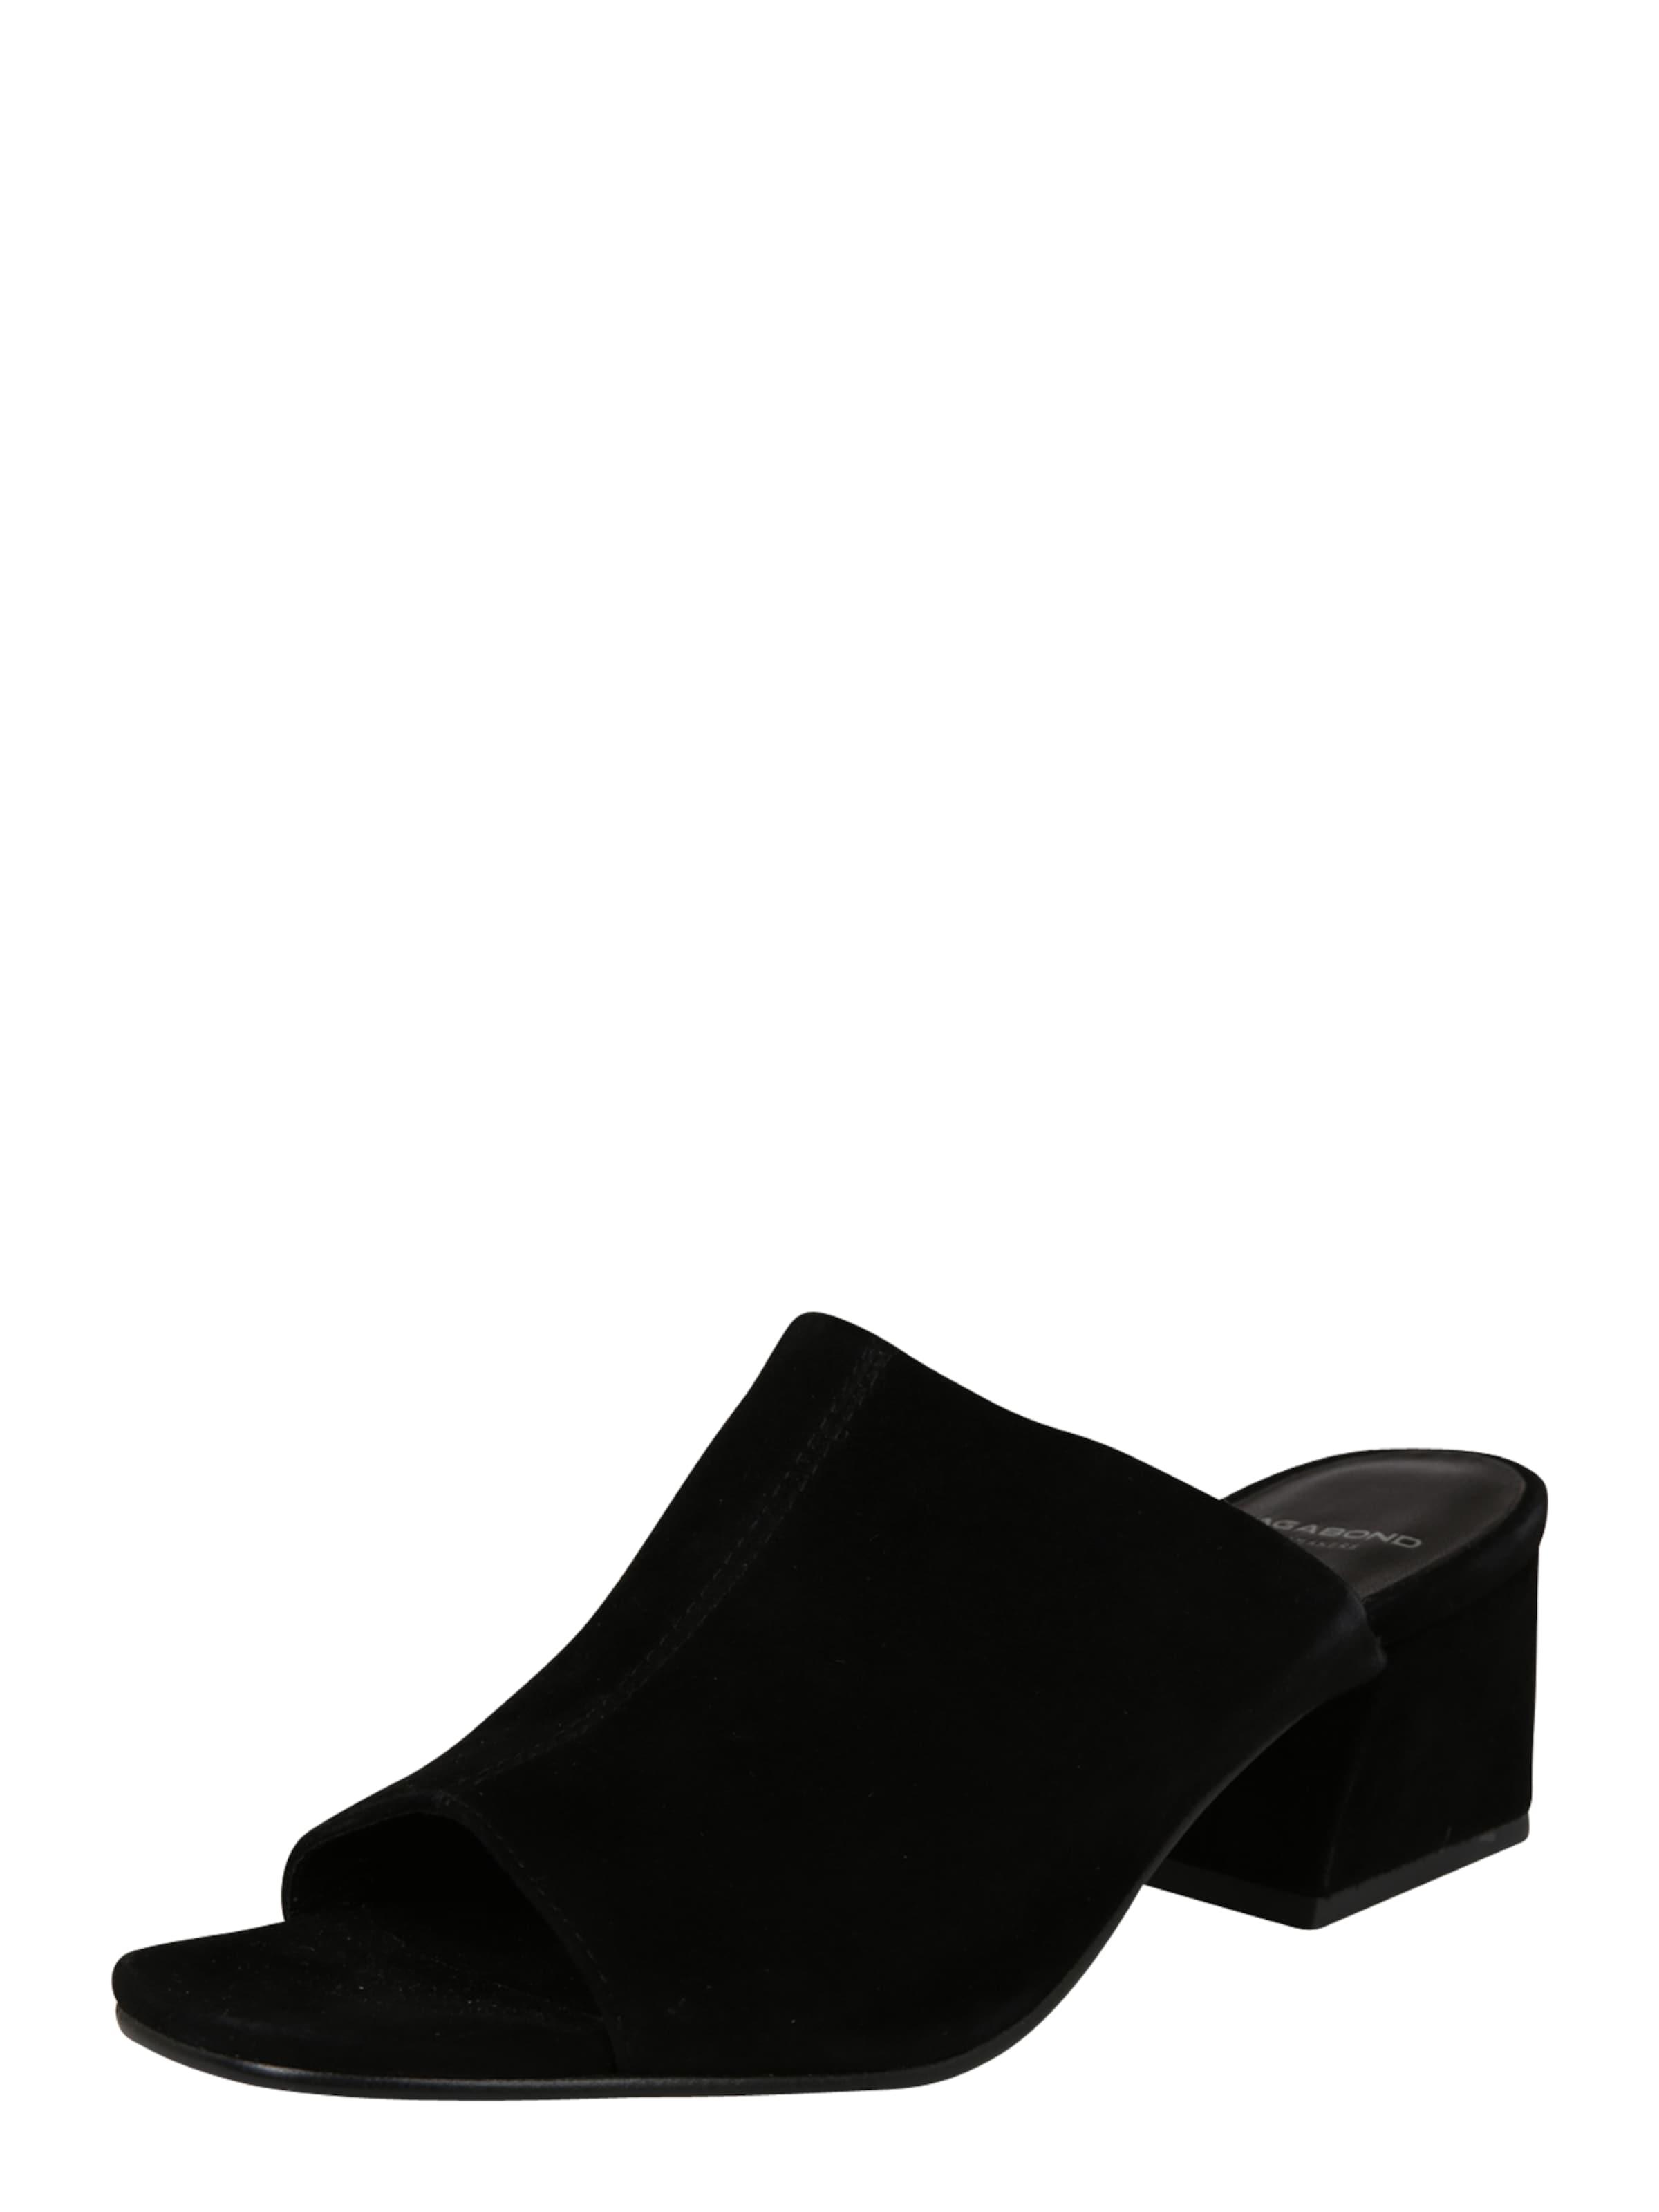 Chaussons 'elena' En Noir Shoemakers Vagabond 0kXZ8nNwOP